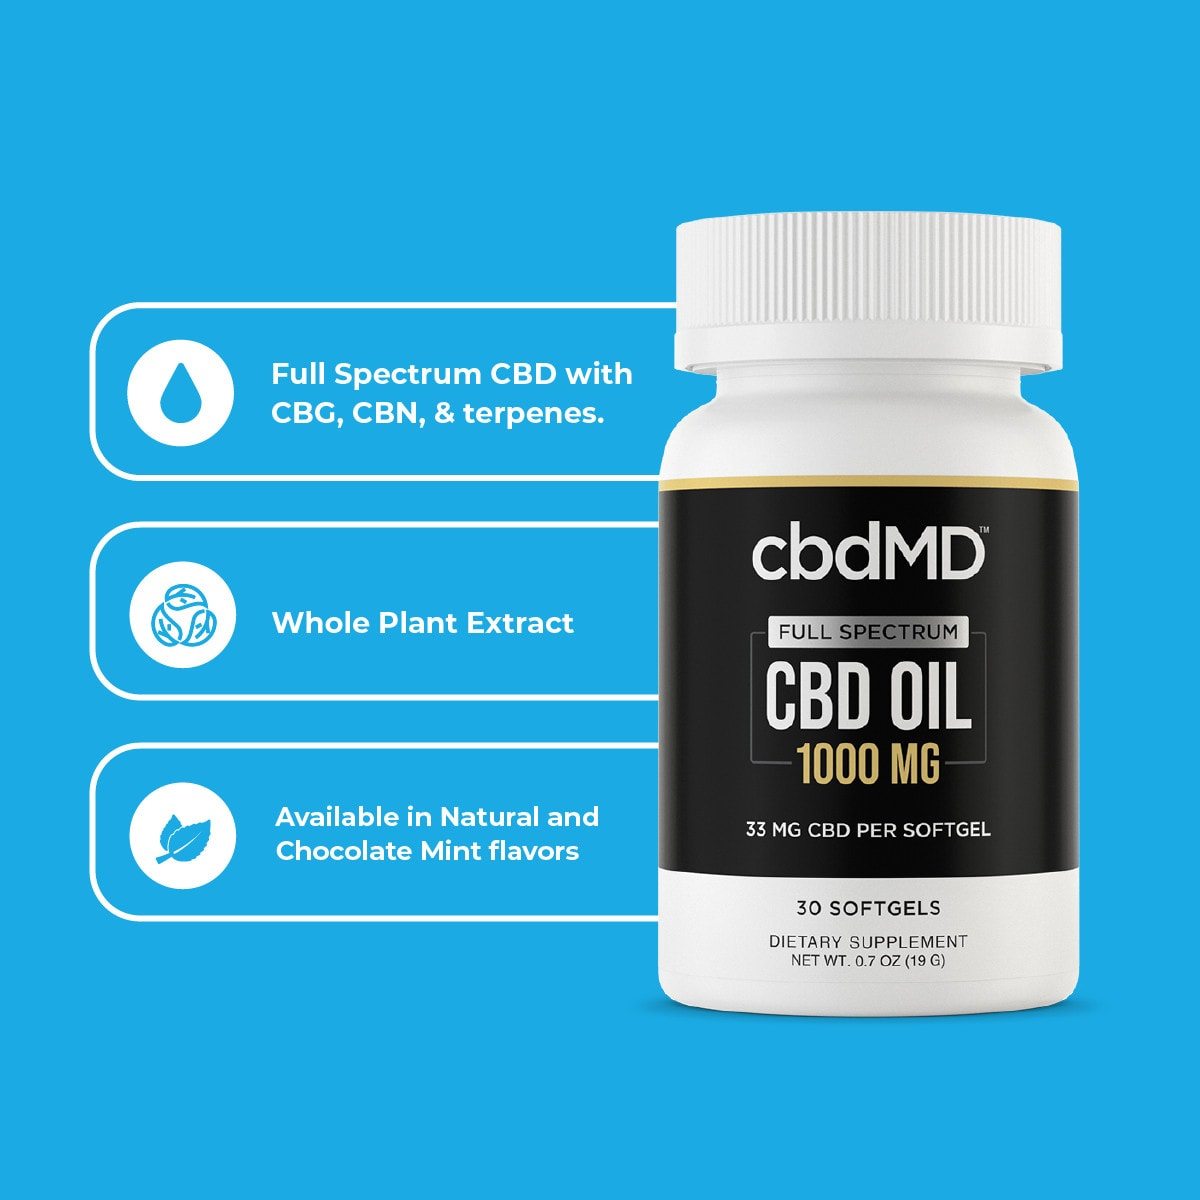 cbdMD, CBD Oil Softgels, Full Spectrum, 30-Count, 1000mg CBD 3